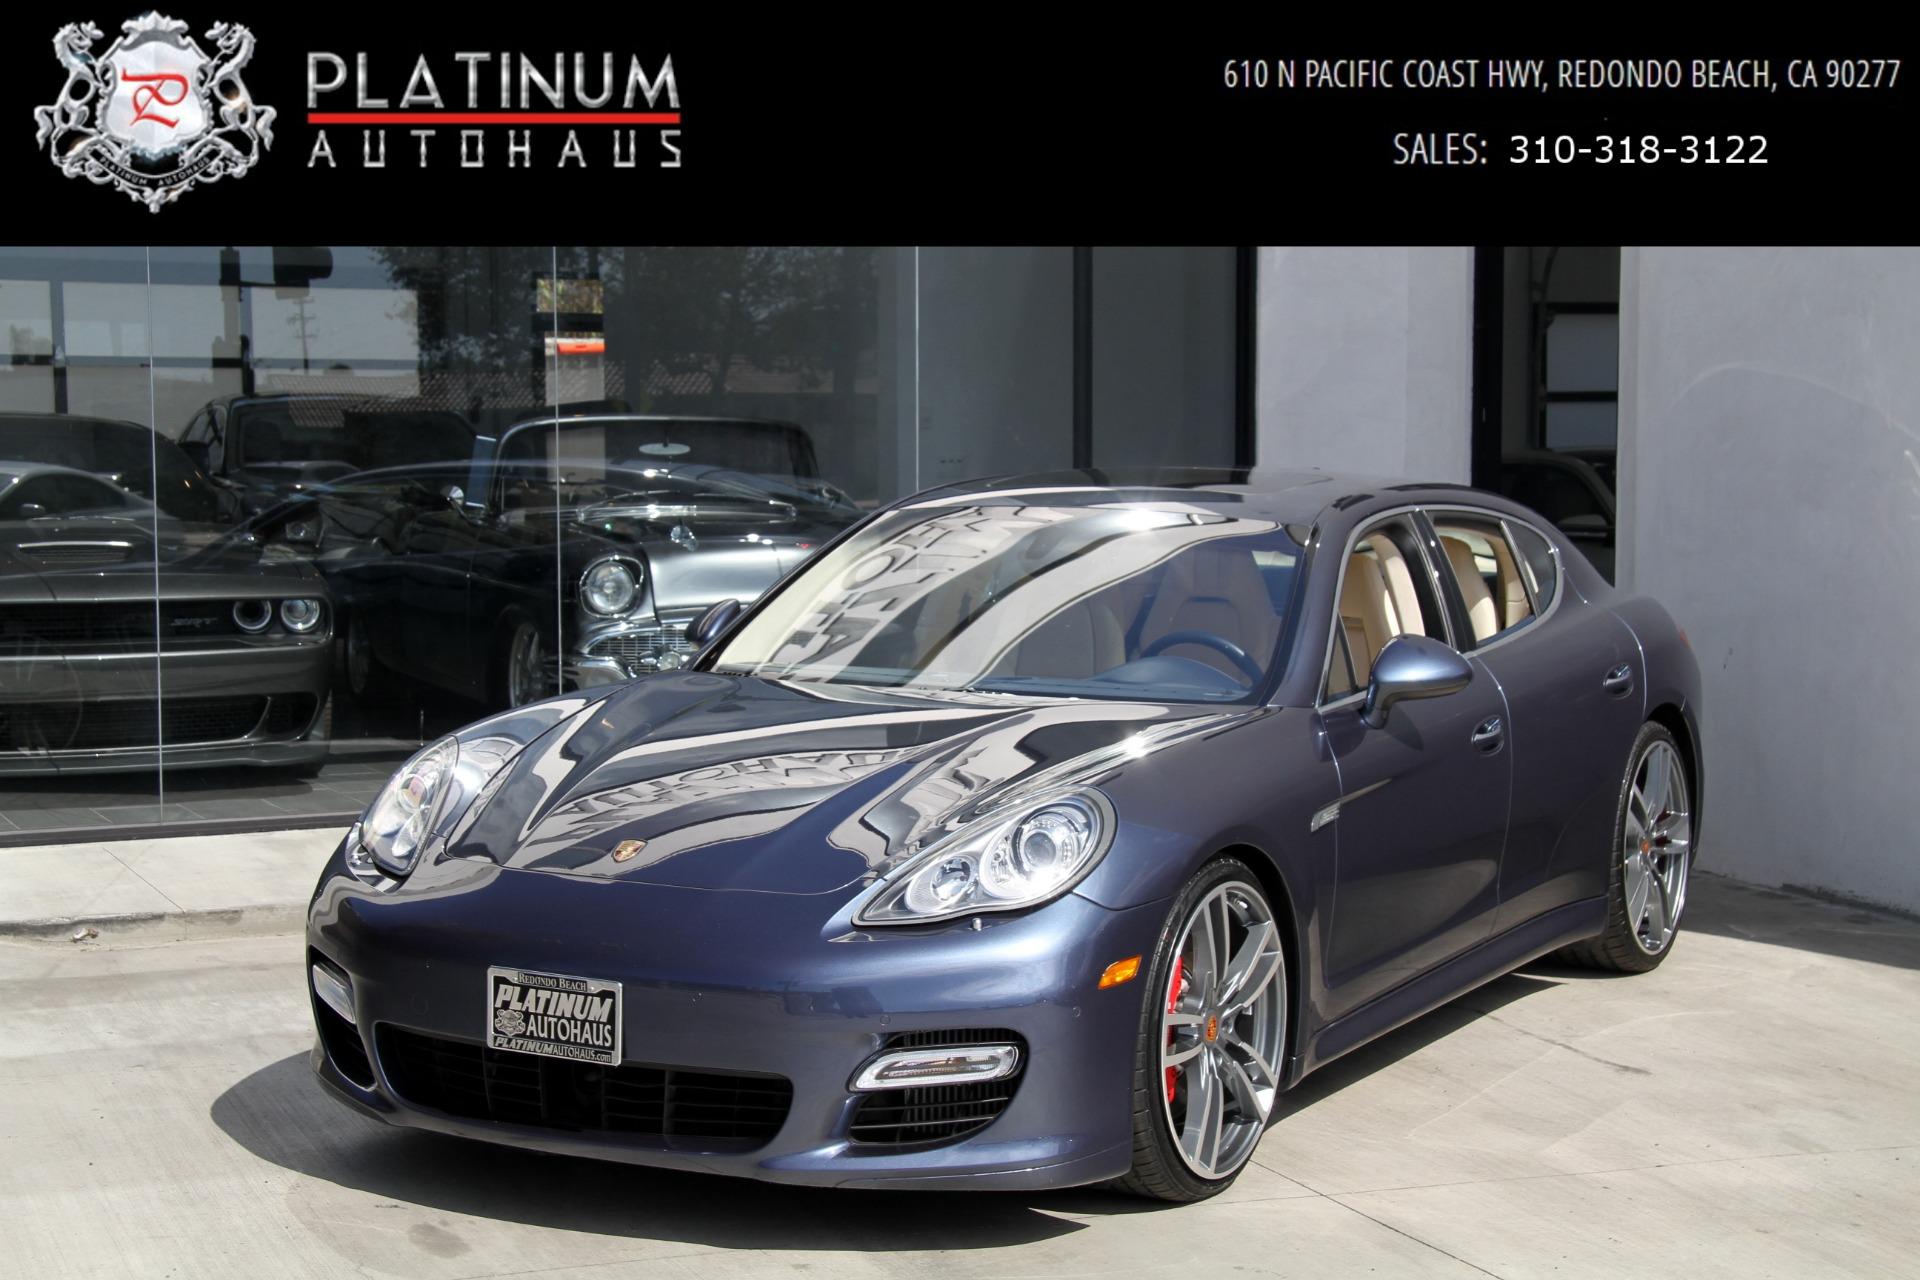 2010 Porsche Panamera Turbo Stock 6276 For Sale Near Redondo Beach